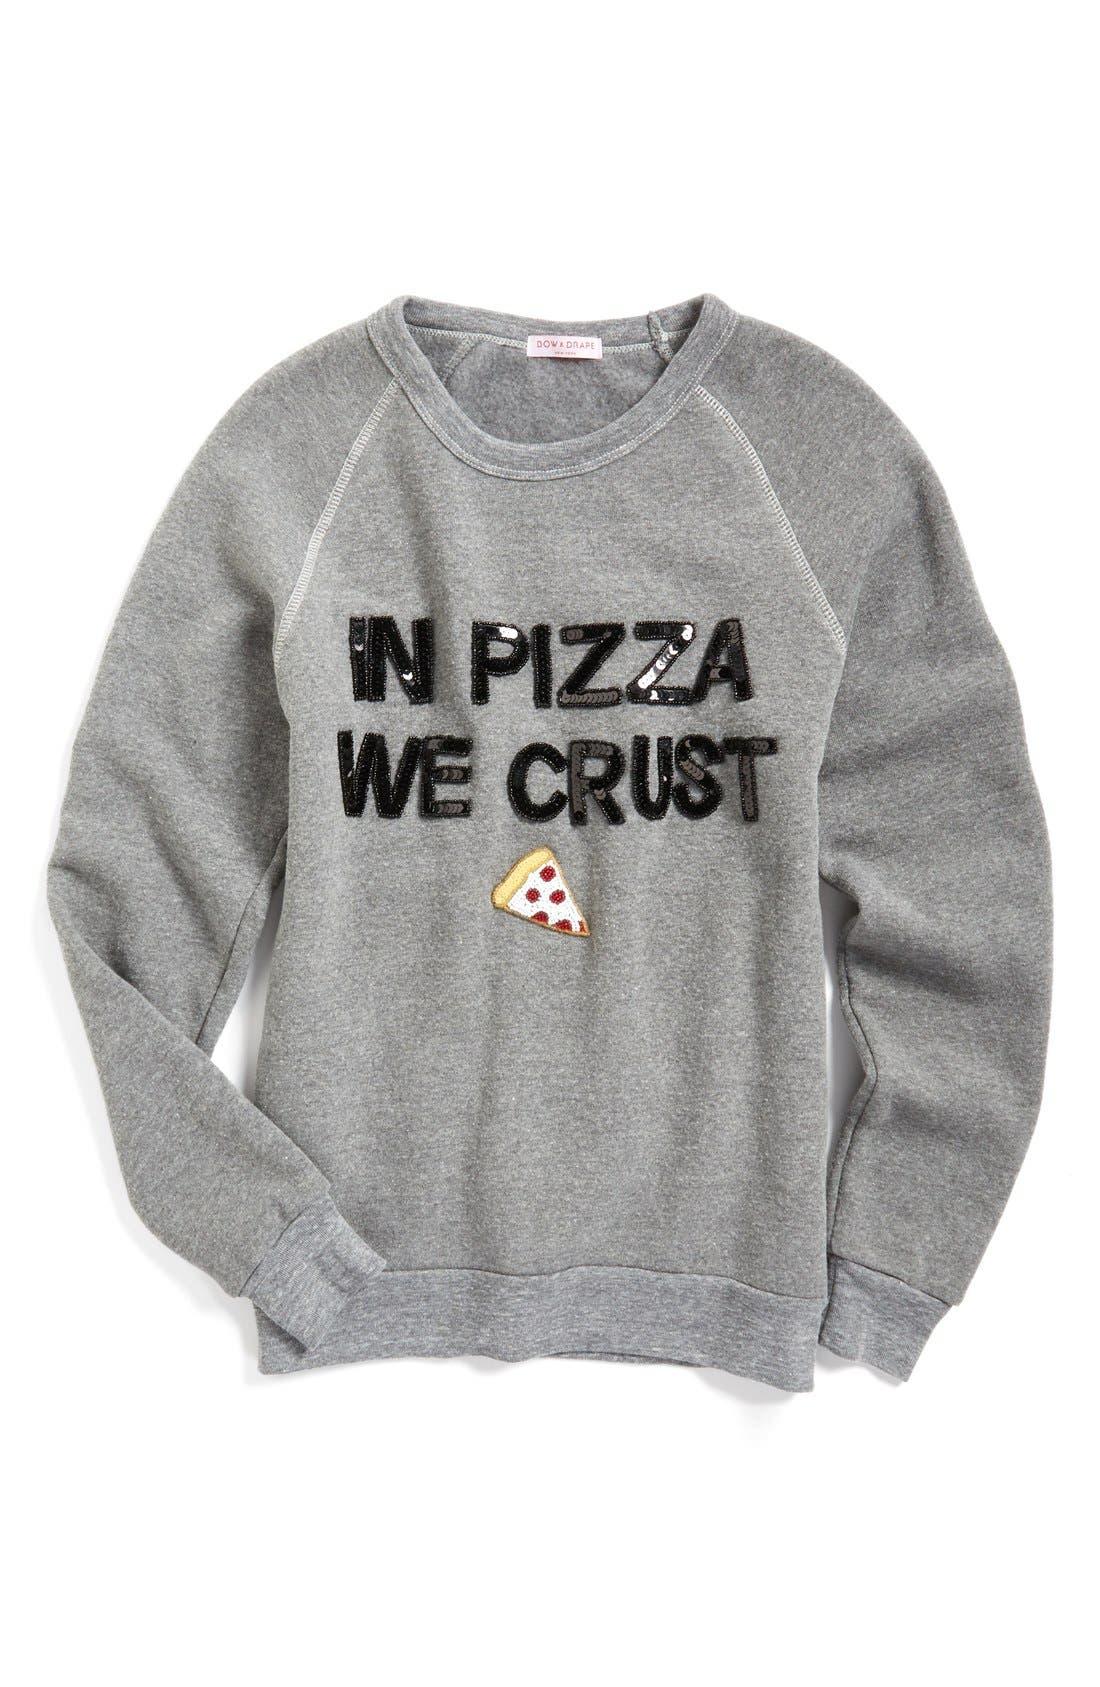 Alternate Image 1 Selected - Bow & Drape In Pizza We Crust Sweatshirt